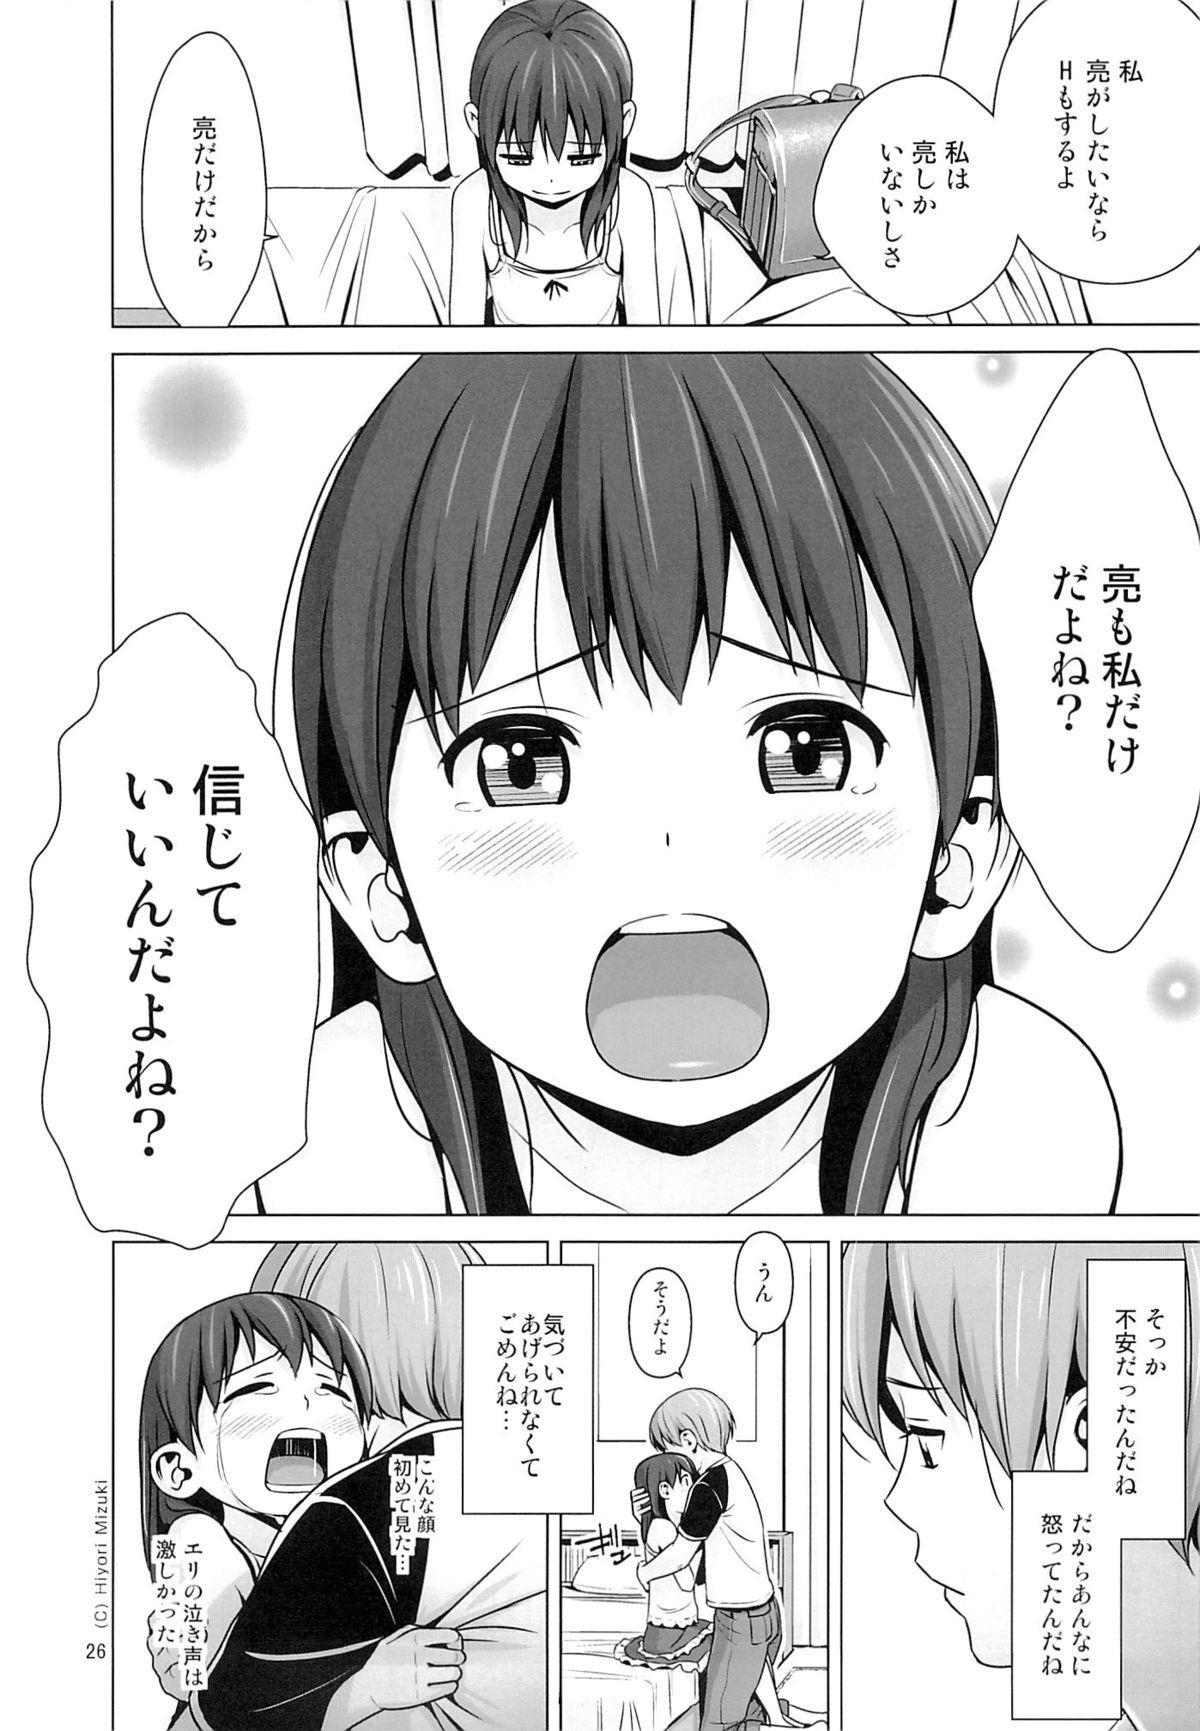 Hairo-ism Sukumizu Syndrome Vol. 0 26